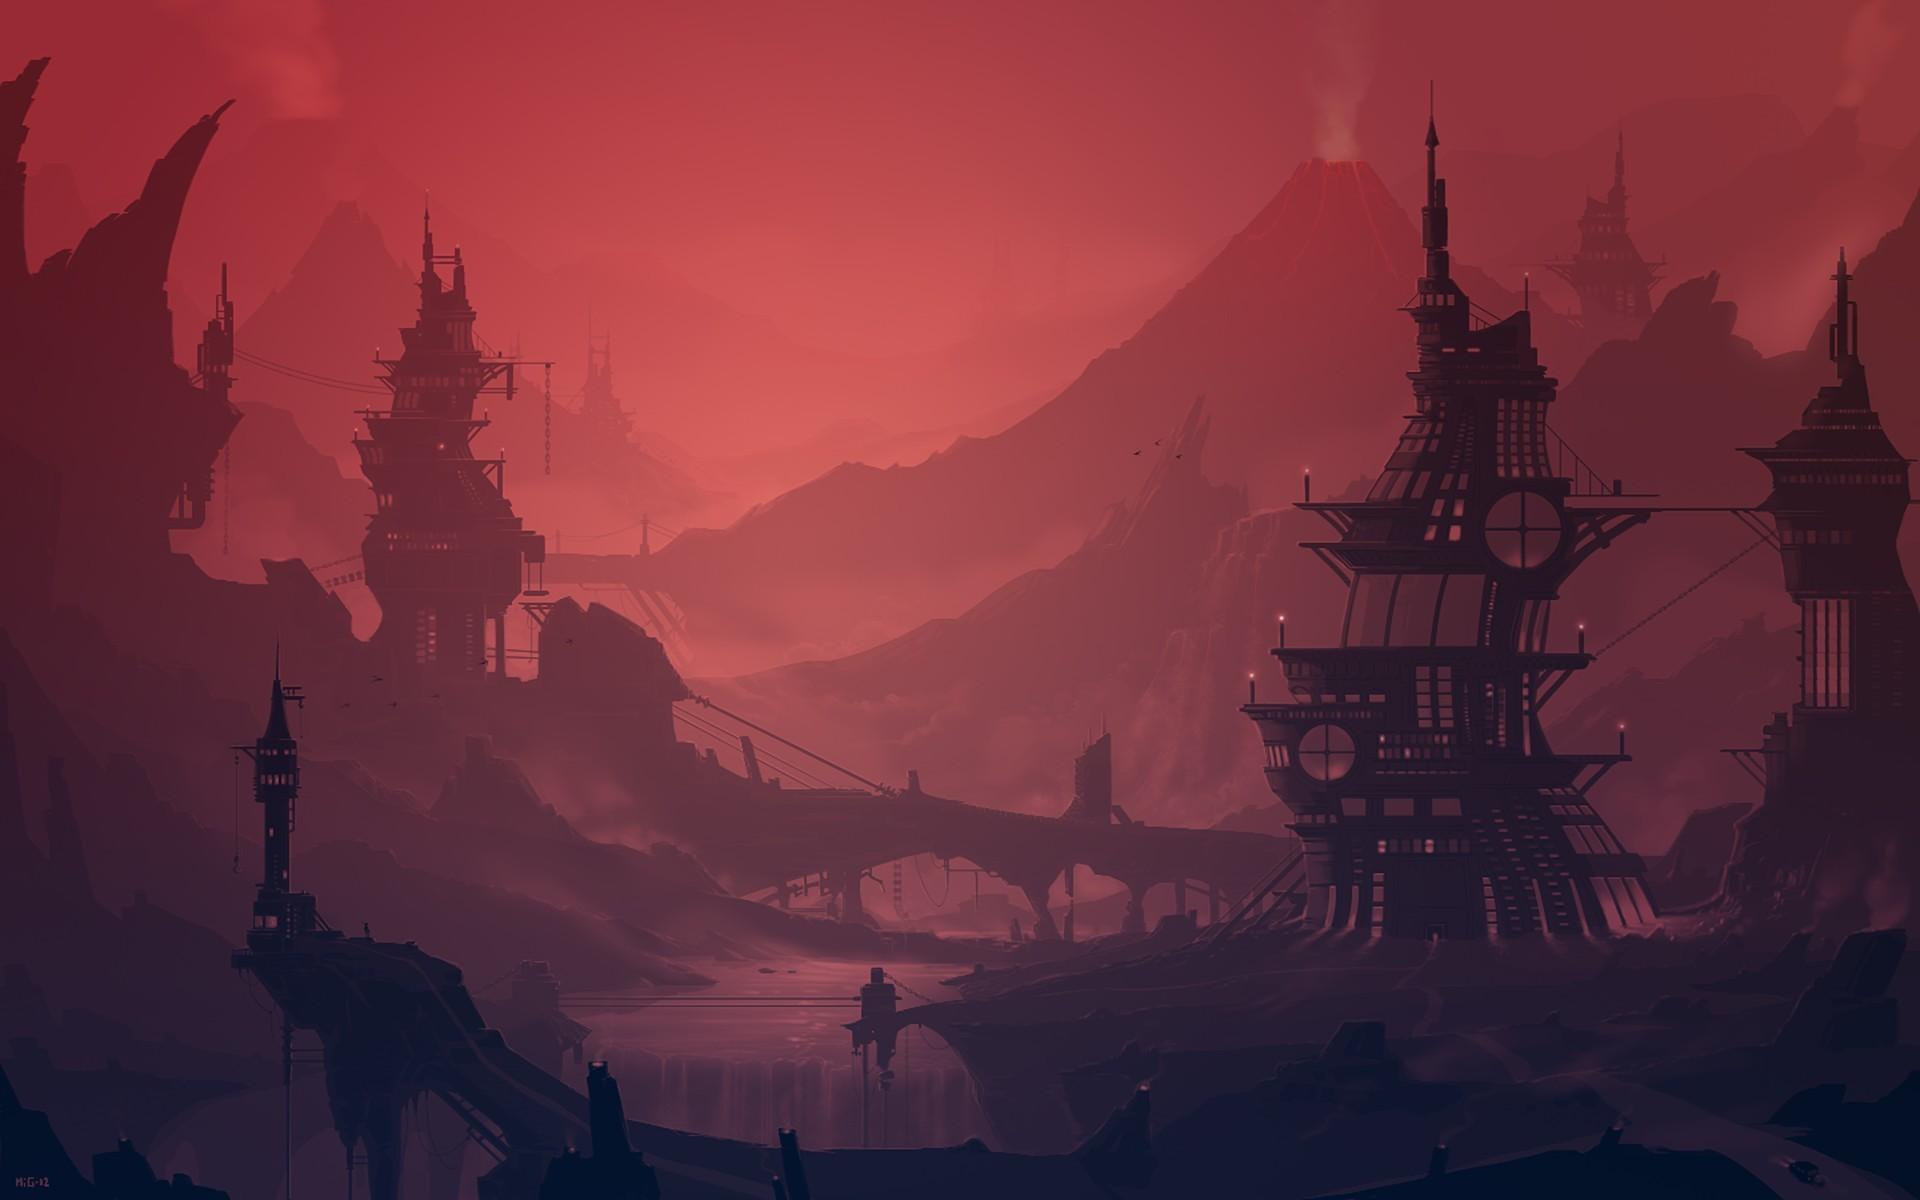 Illustration Sunset Artwork Sunrise Science Fiction Dusk Ghost Ship Dawn Darkness Screenshot Atmospheric Phenomenon Computer Wallpaper